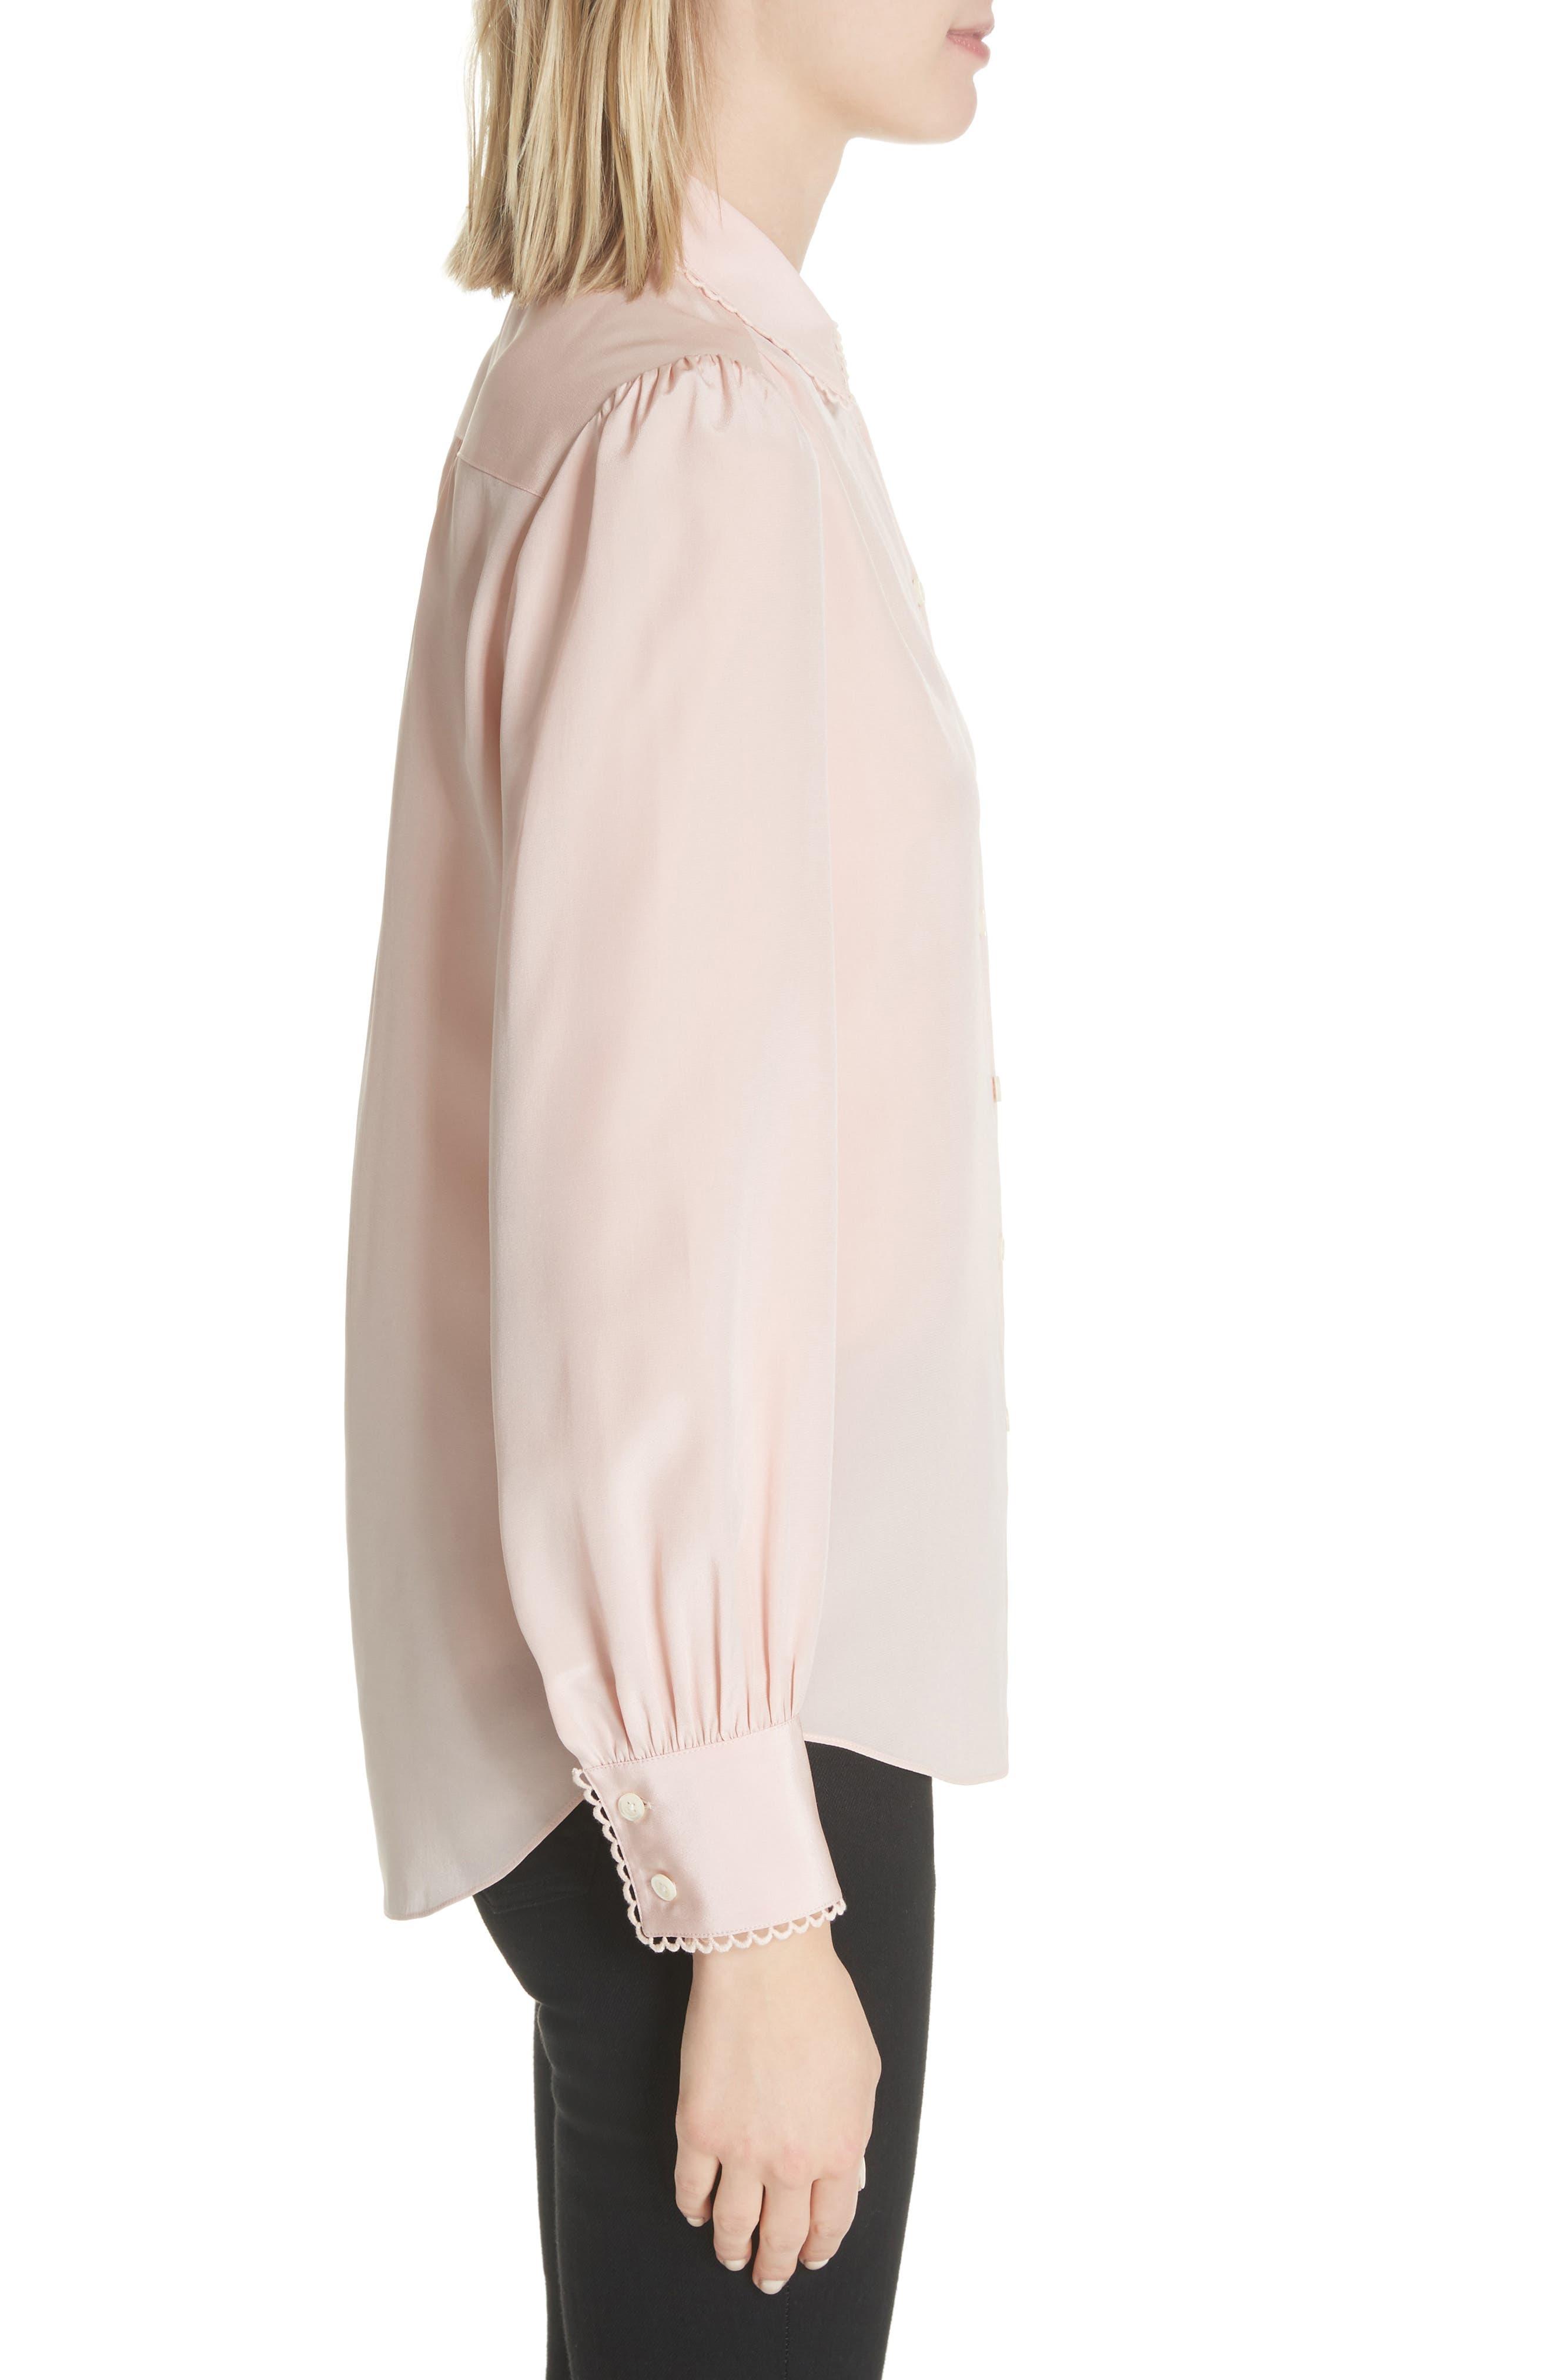 KATE SPADE NEW YORK,                             scallop trim silk shirt,                             Alternate thumbnail 3, color,                             663